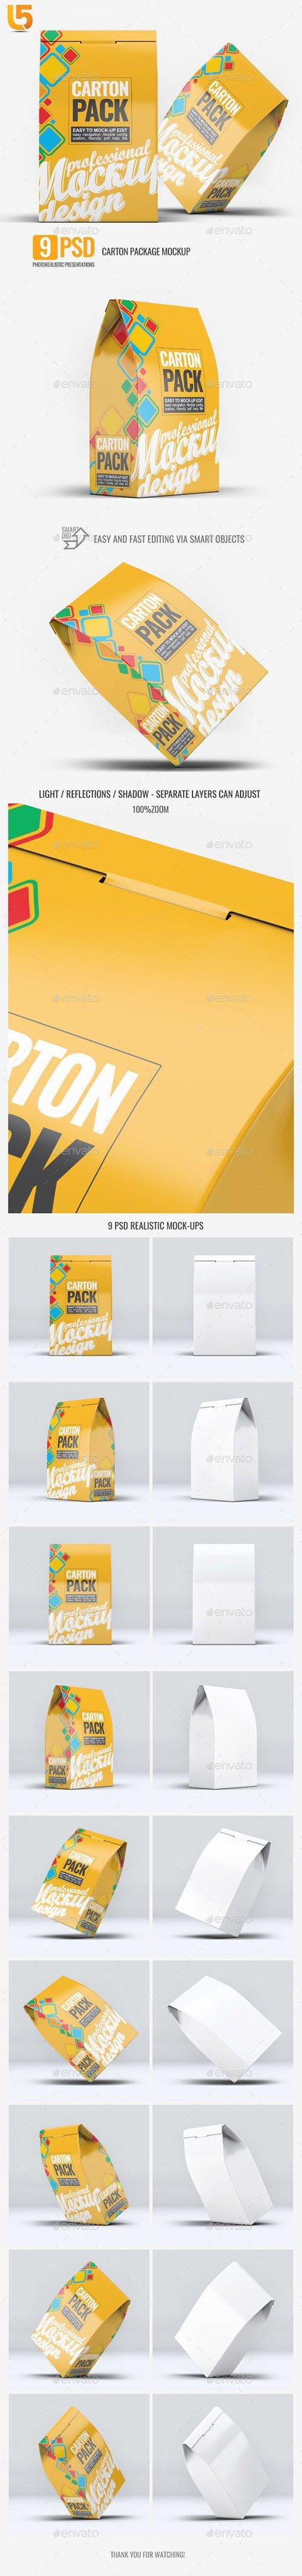 Carton Box Pack Mock-Up 23224959